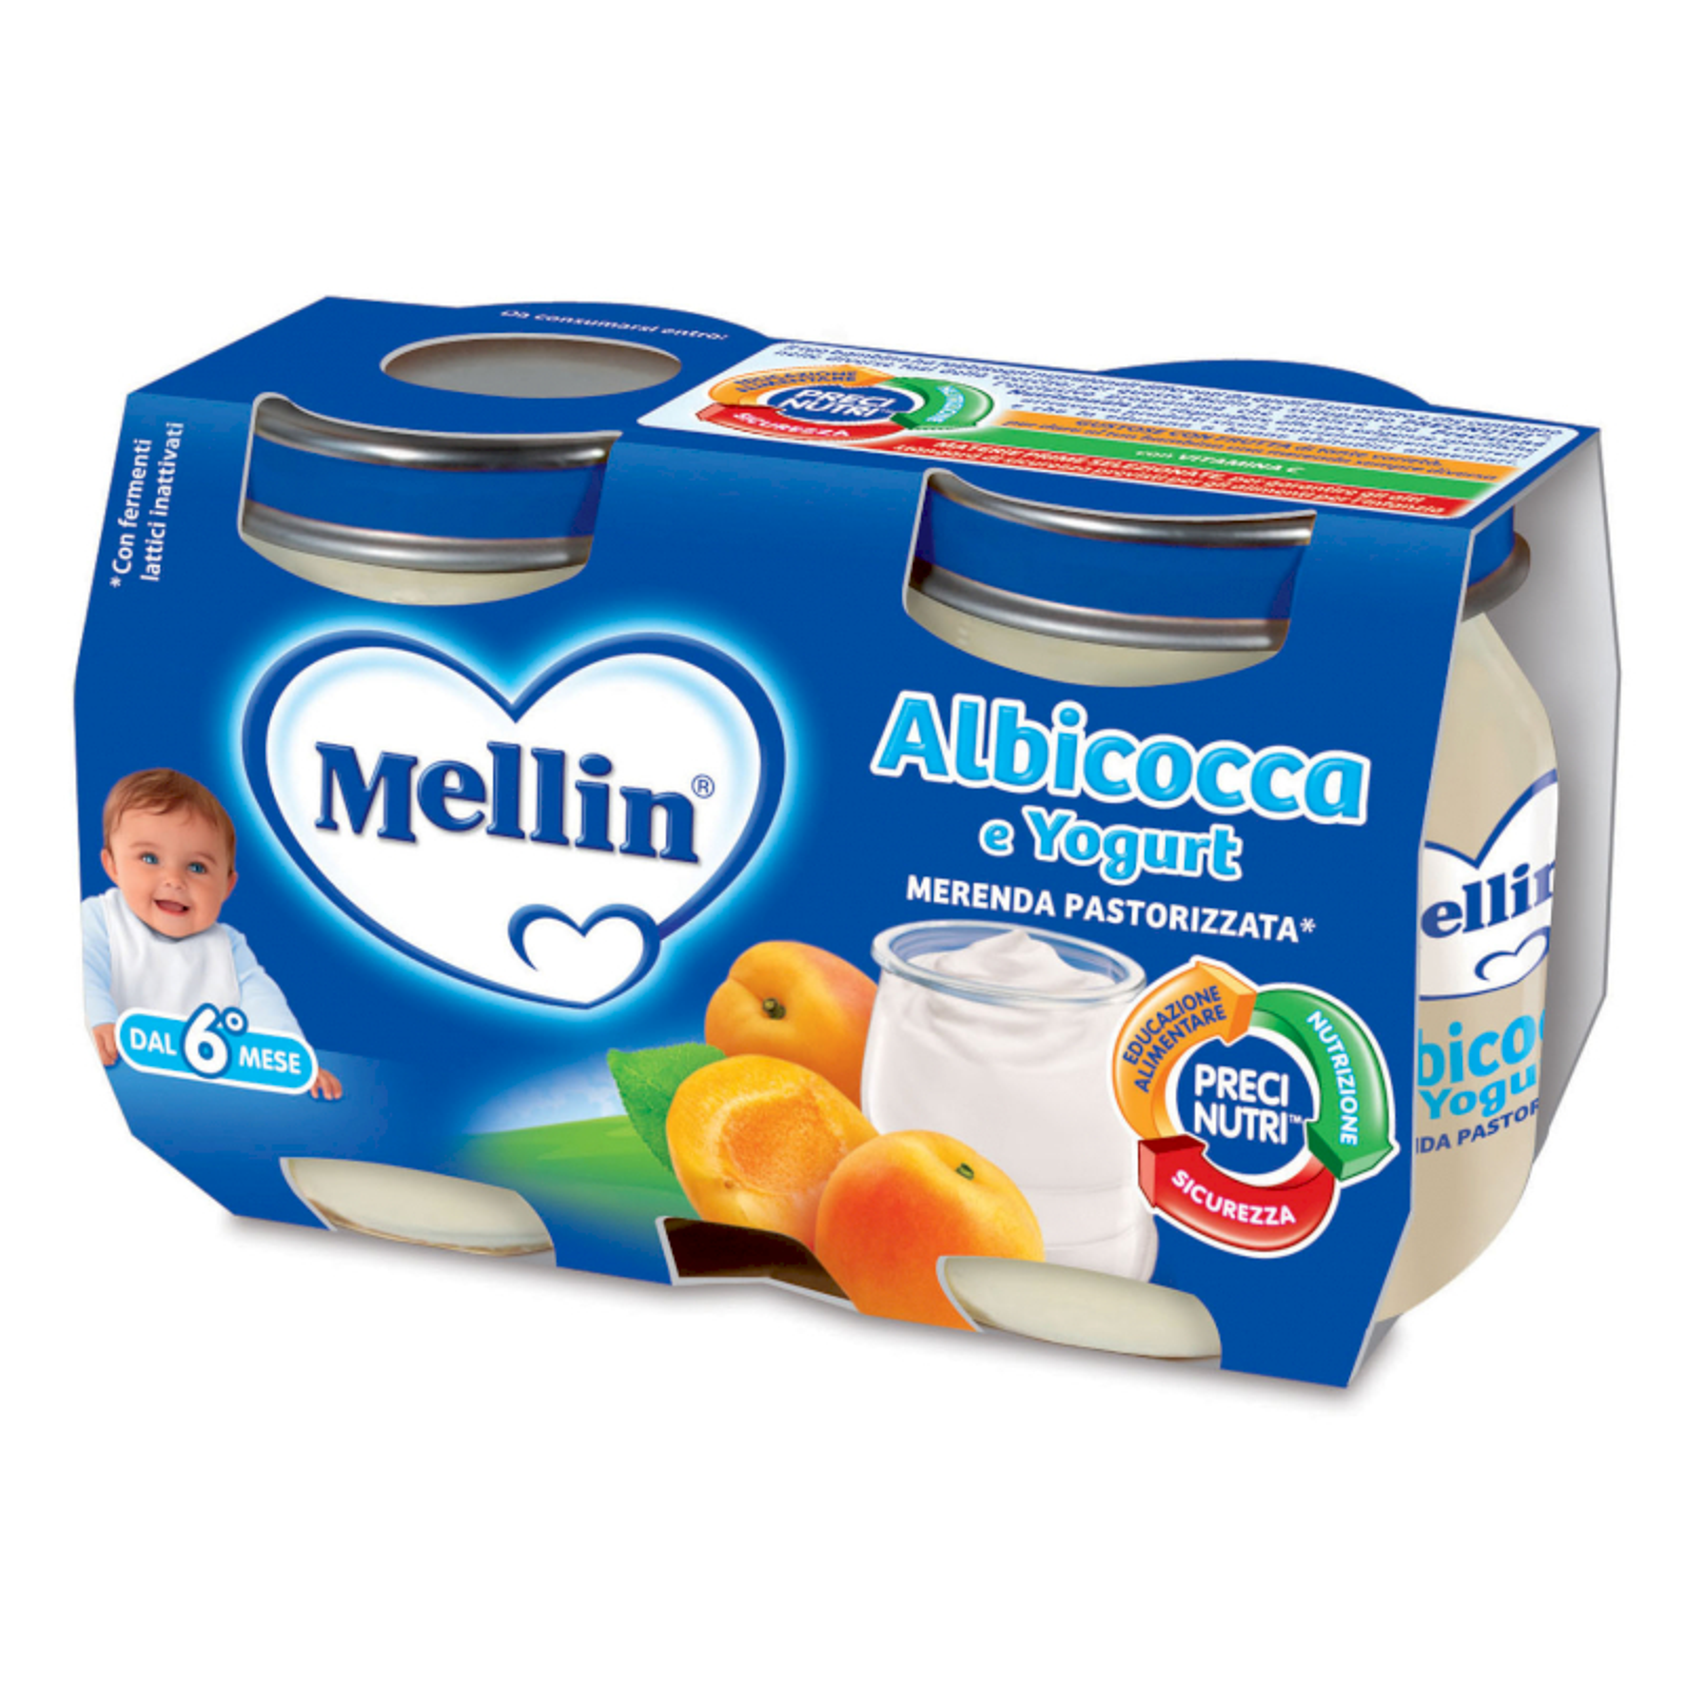 Merenda Mellin - Albicocca e Yogurt